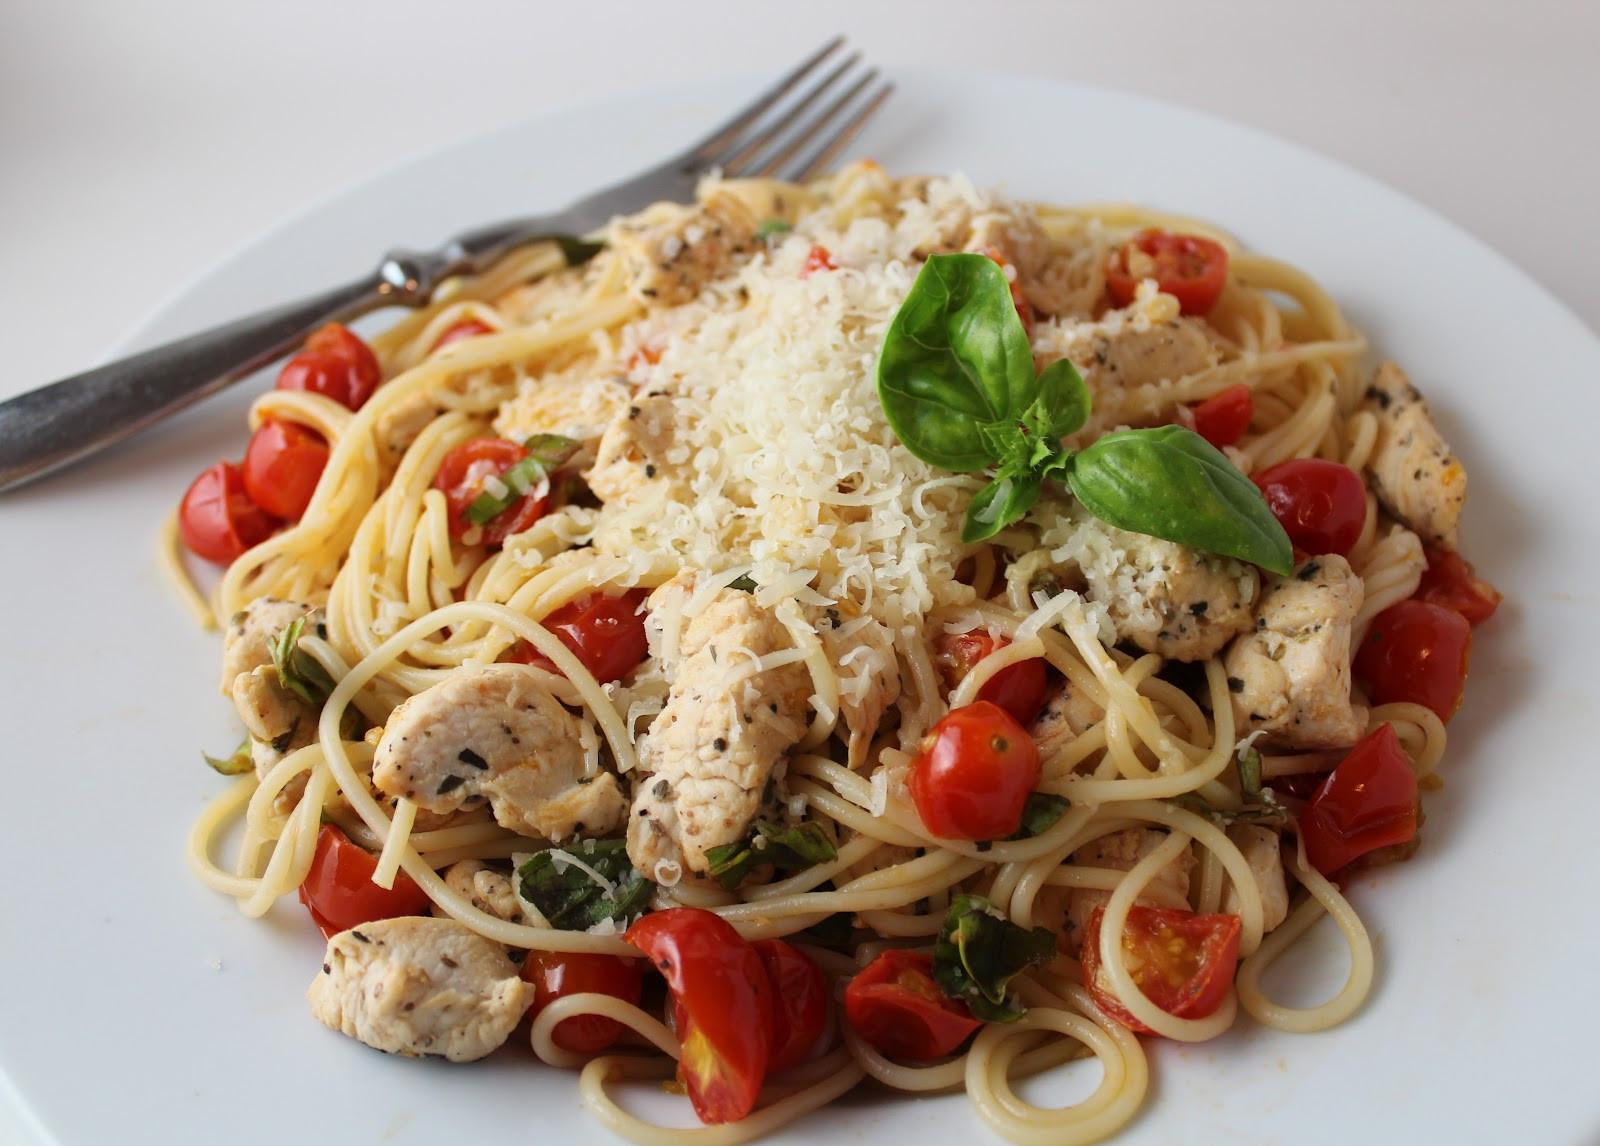 Healthy Chicken Spaghetti 20 Of the Best Ideas for Healthy & Light Spaghetti with Sauteed Chicken and Grape